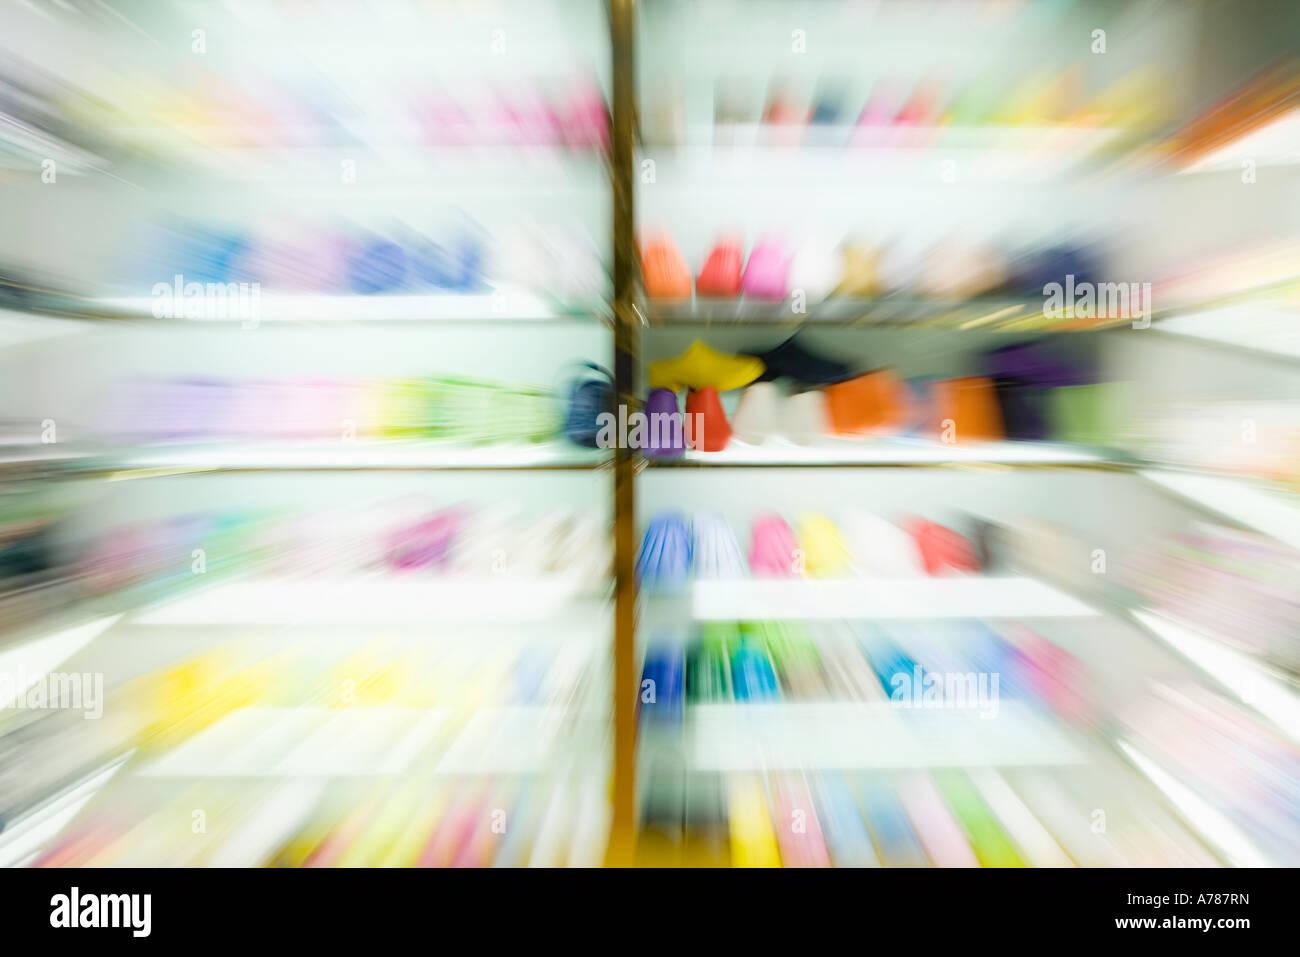 Portoirs de chaussures, blurred Photo Stock